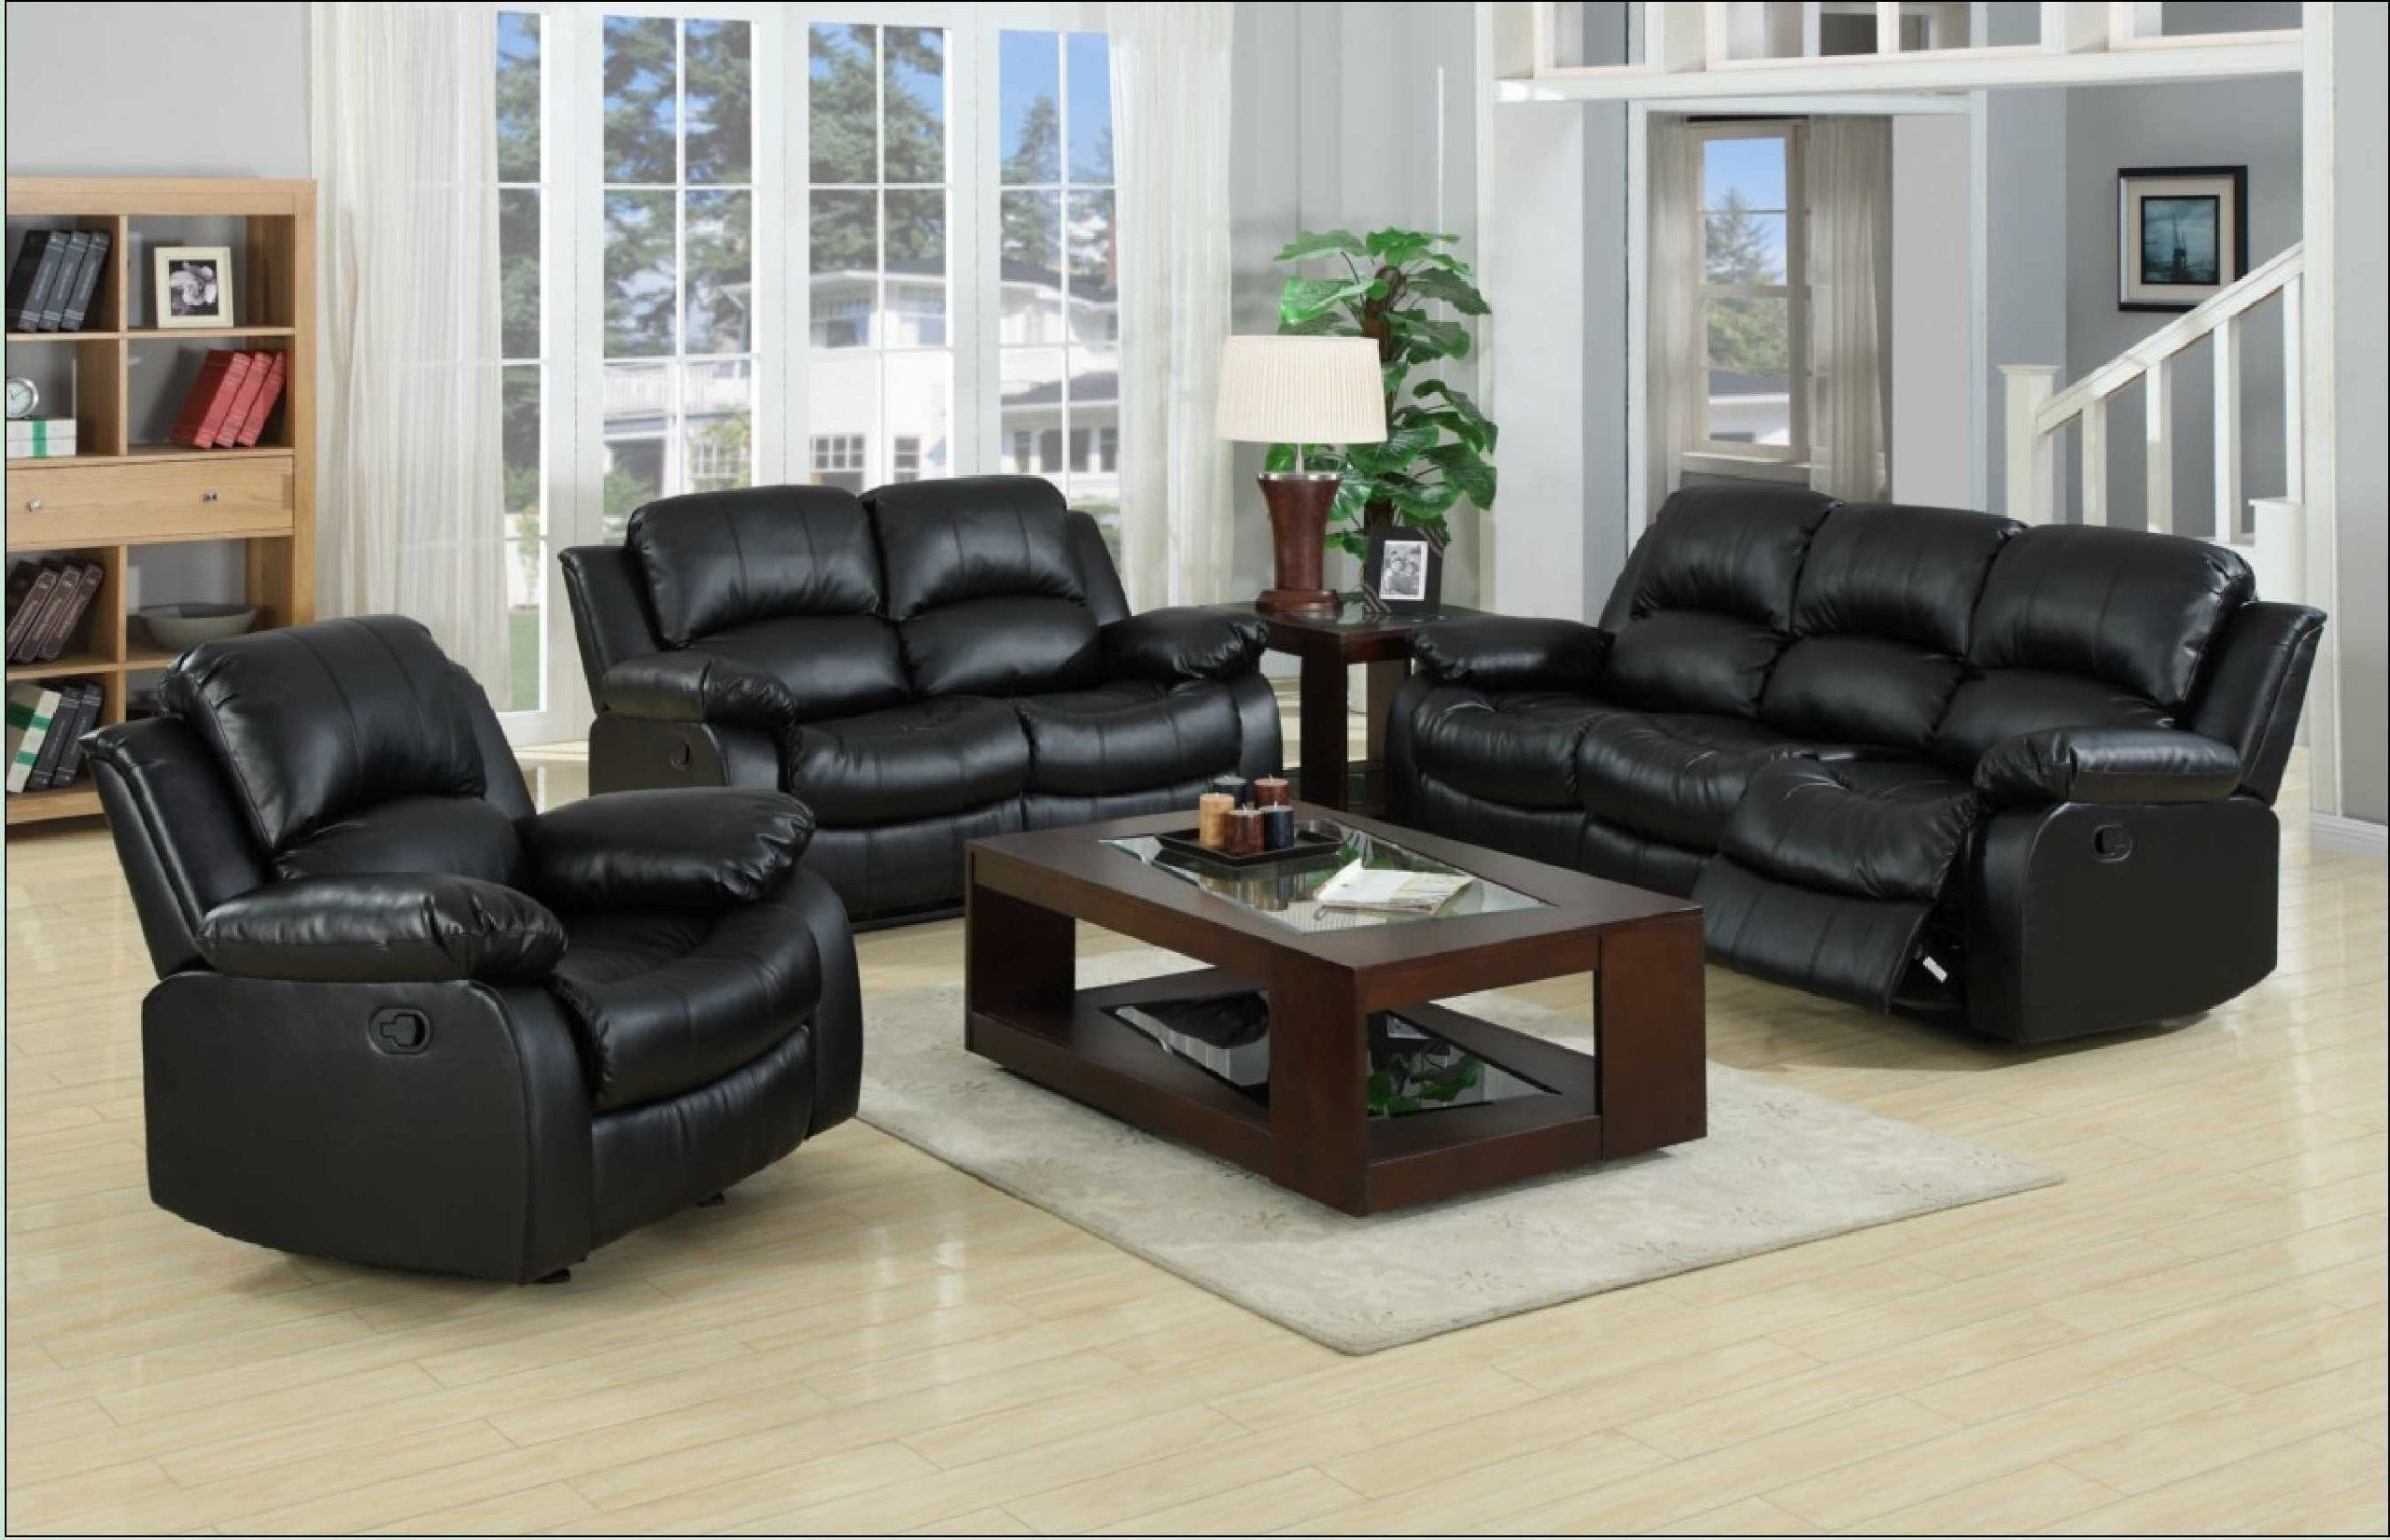 Surprising Yuan Tai Kaden Black Bonded Leather Sofa Soft And Durable Evergreenethics Interior Chair Design Evergreenethicsorg